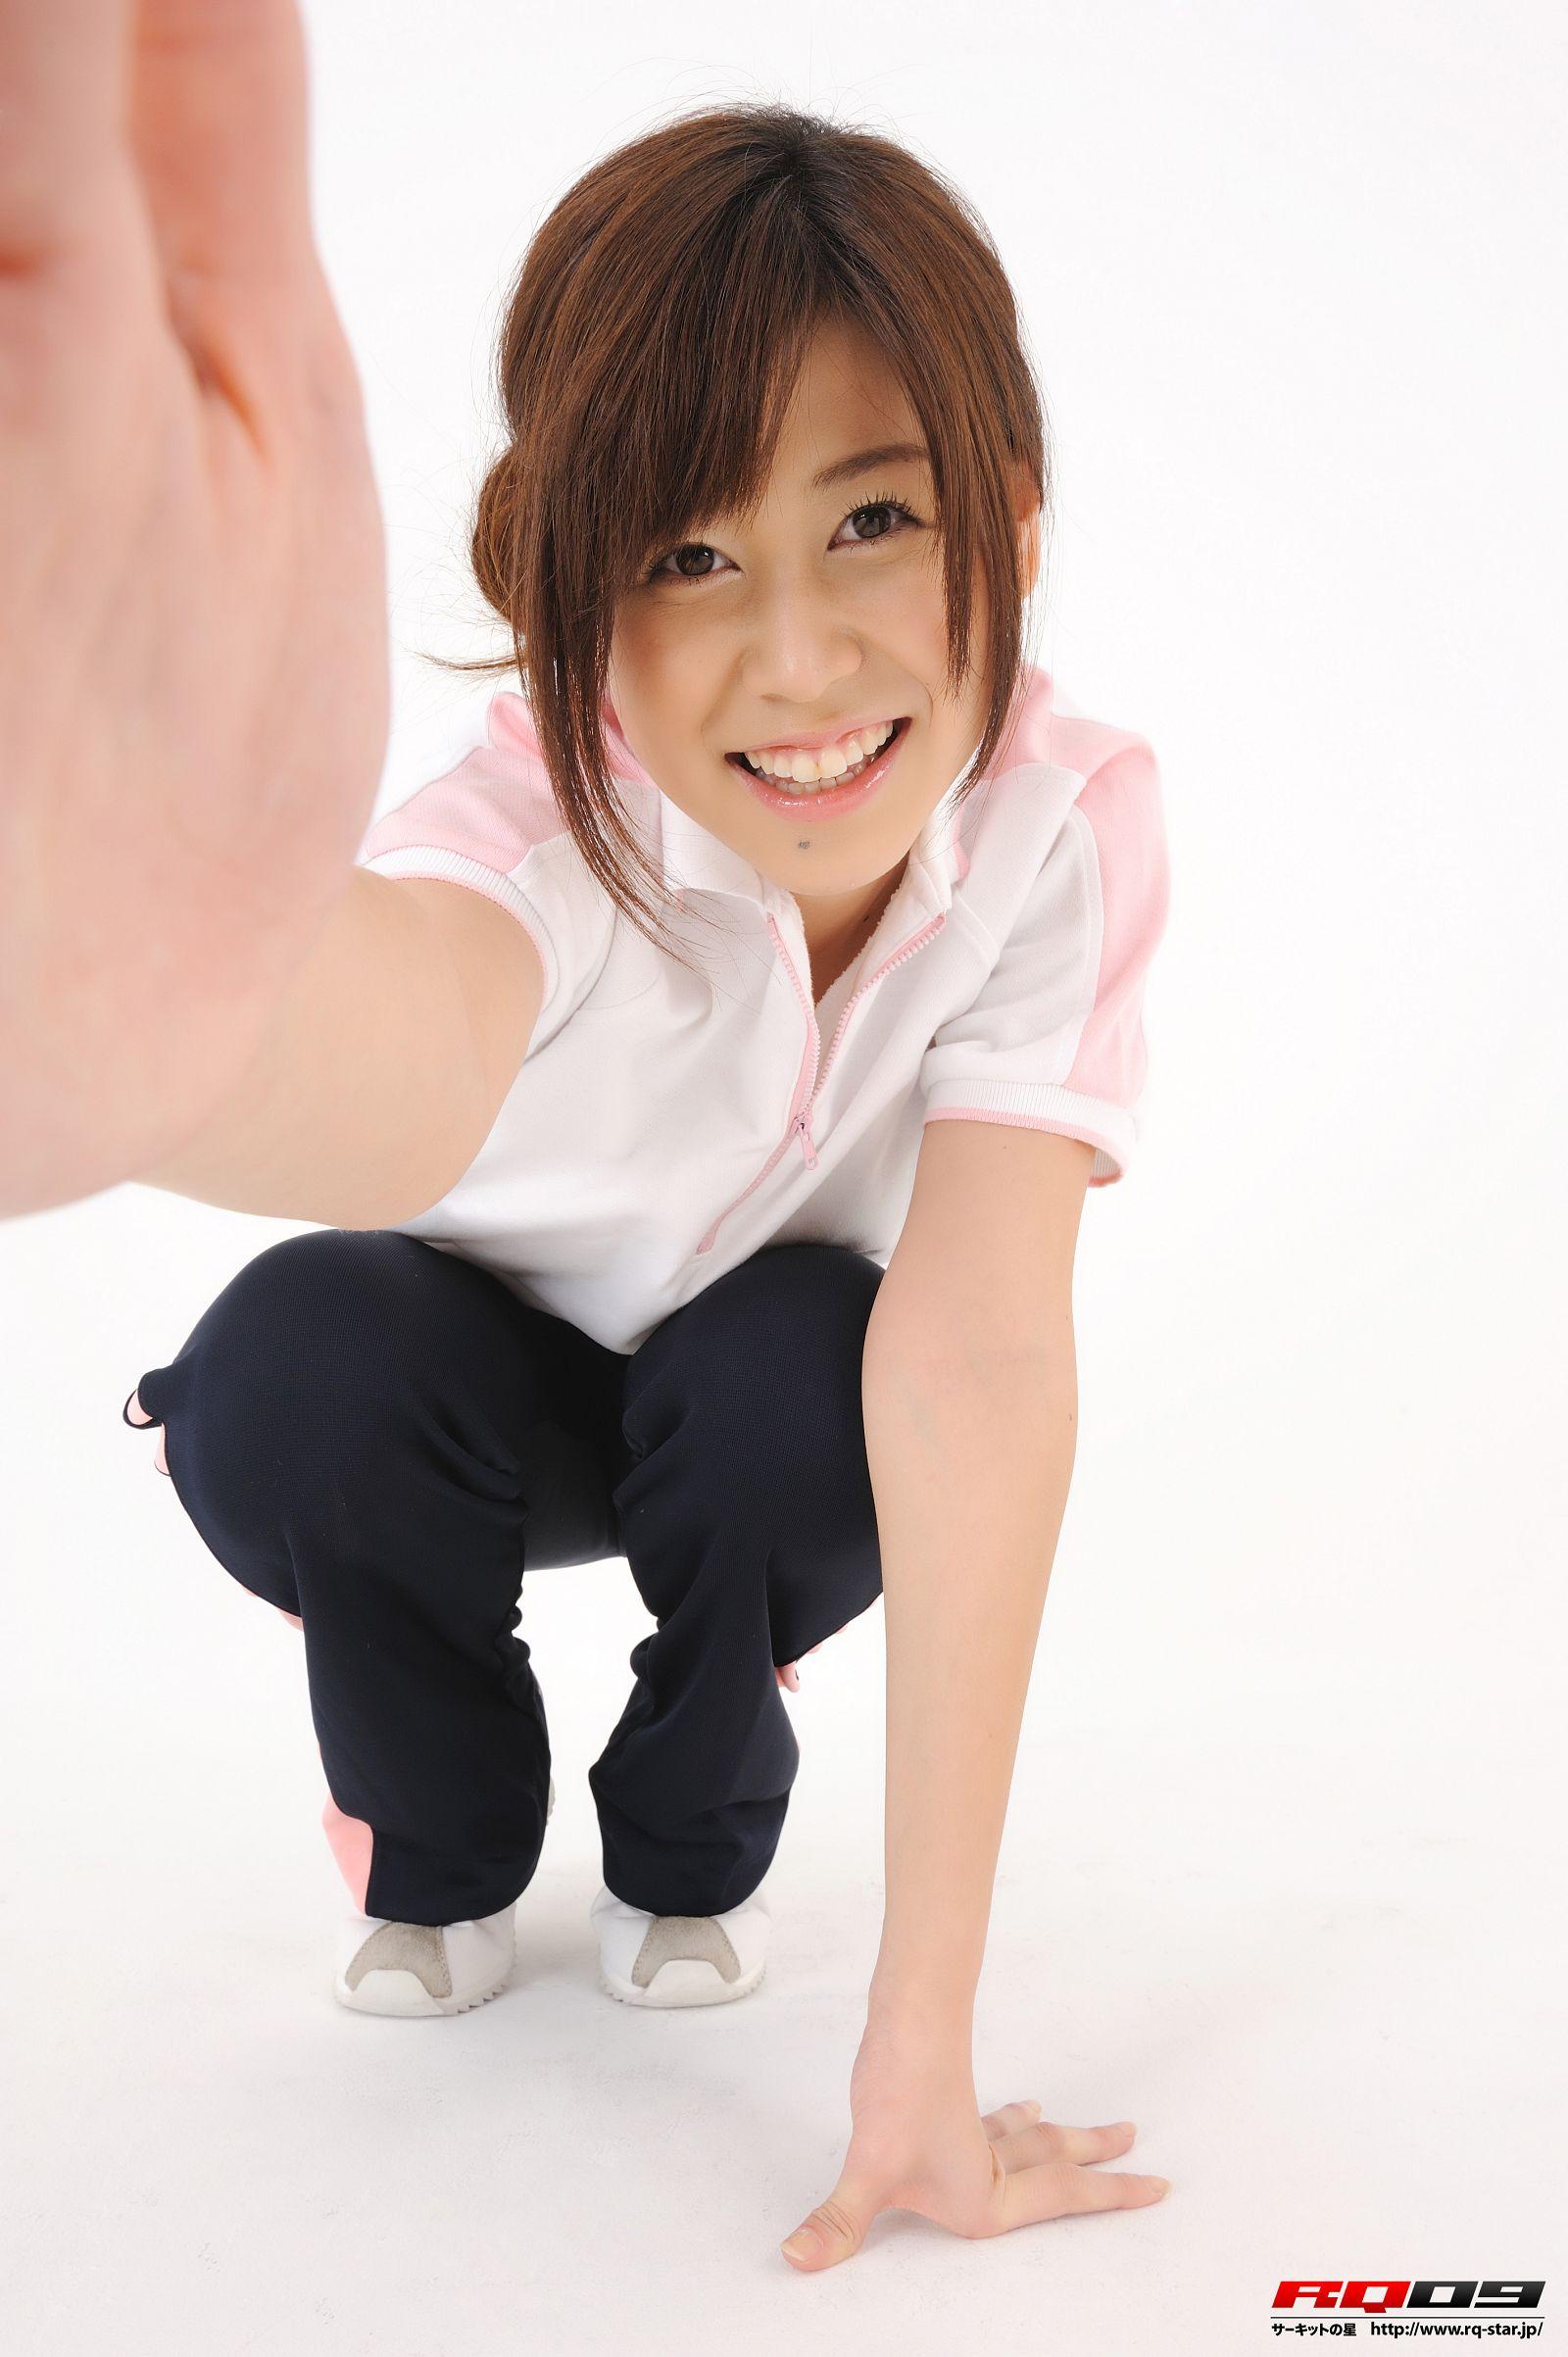 [RQ STAR美女] NO.0133 Airi Nagasaku 永作あいり Kindergartner[50P] RQ STAR 第4张